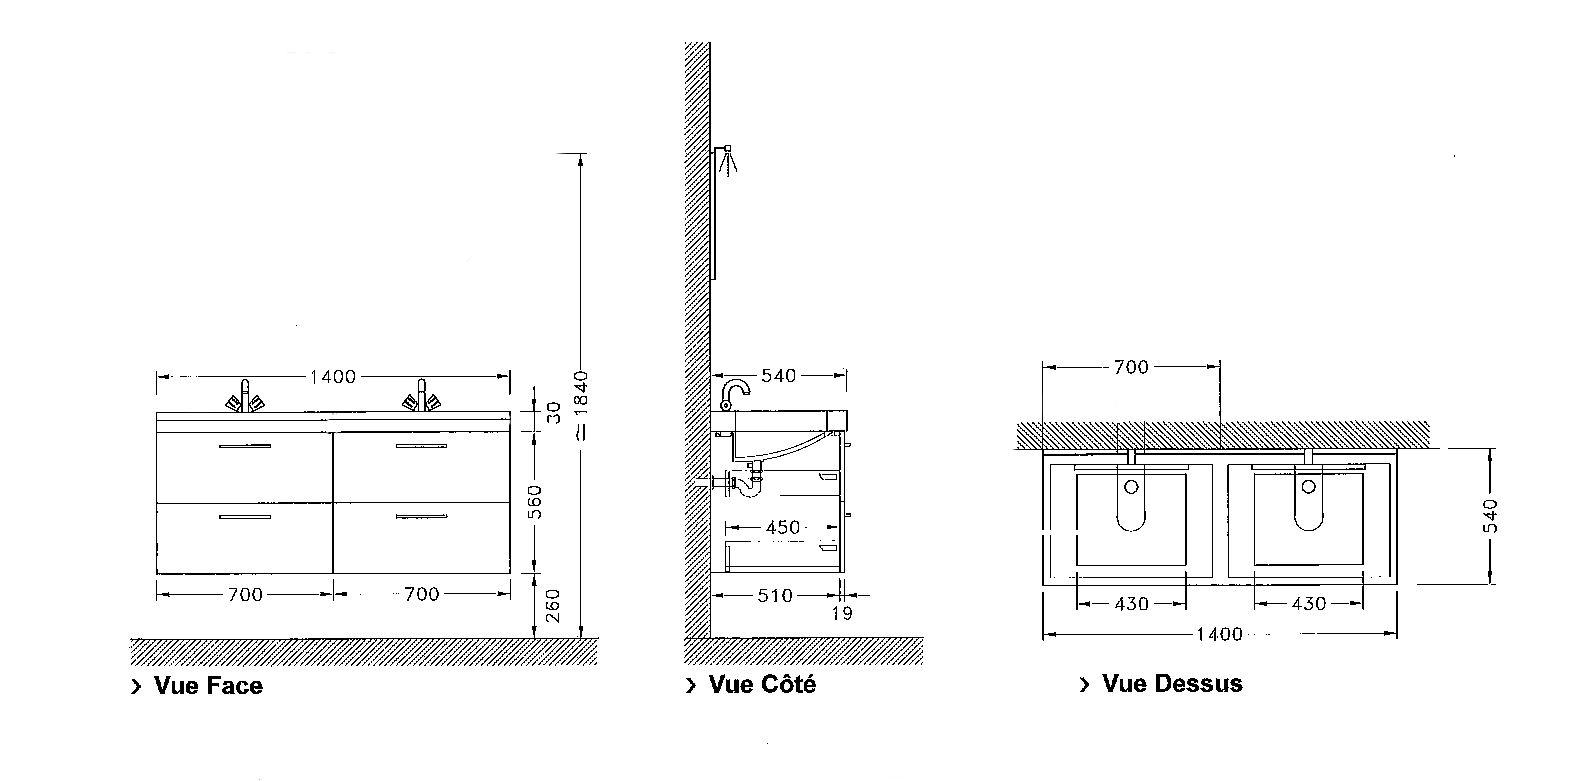 Meuble Salle De Bain Discac Rivage ~ meuble sous vasque loft 4 tiroirs de 140 cm discac